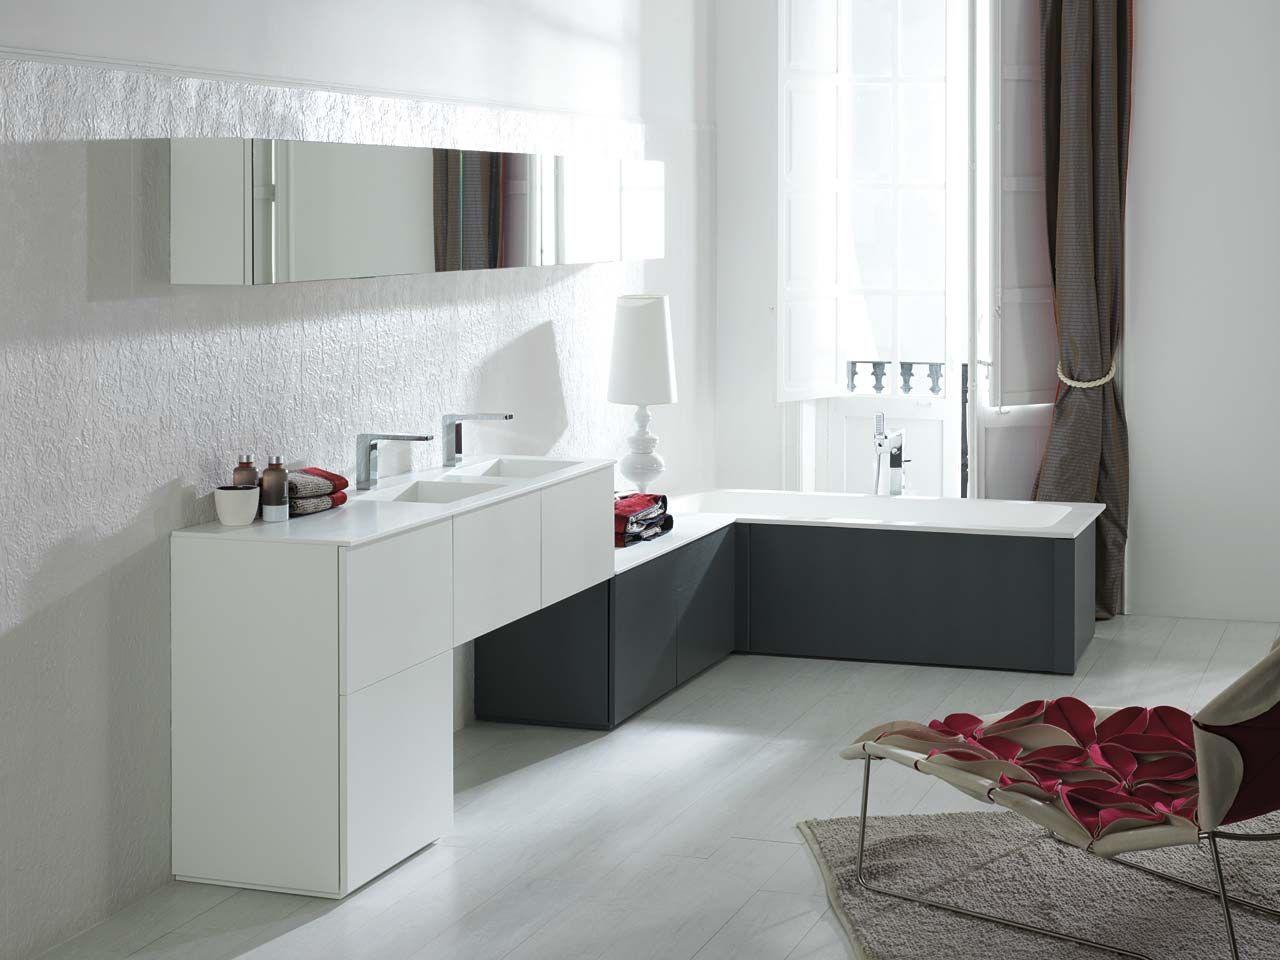 Porcelanosa Bagno Contemporaneo Design Del Bagno Arredamento Bagno